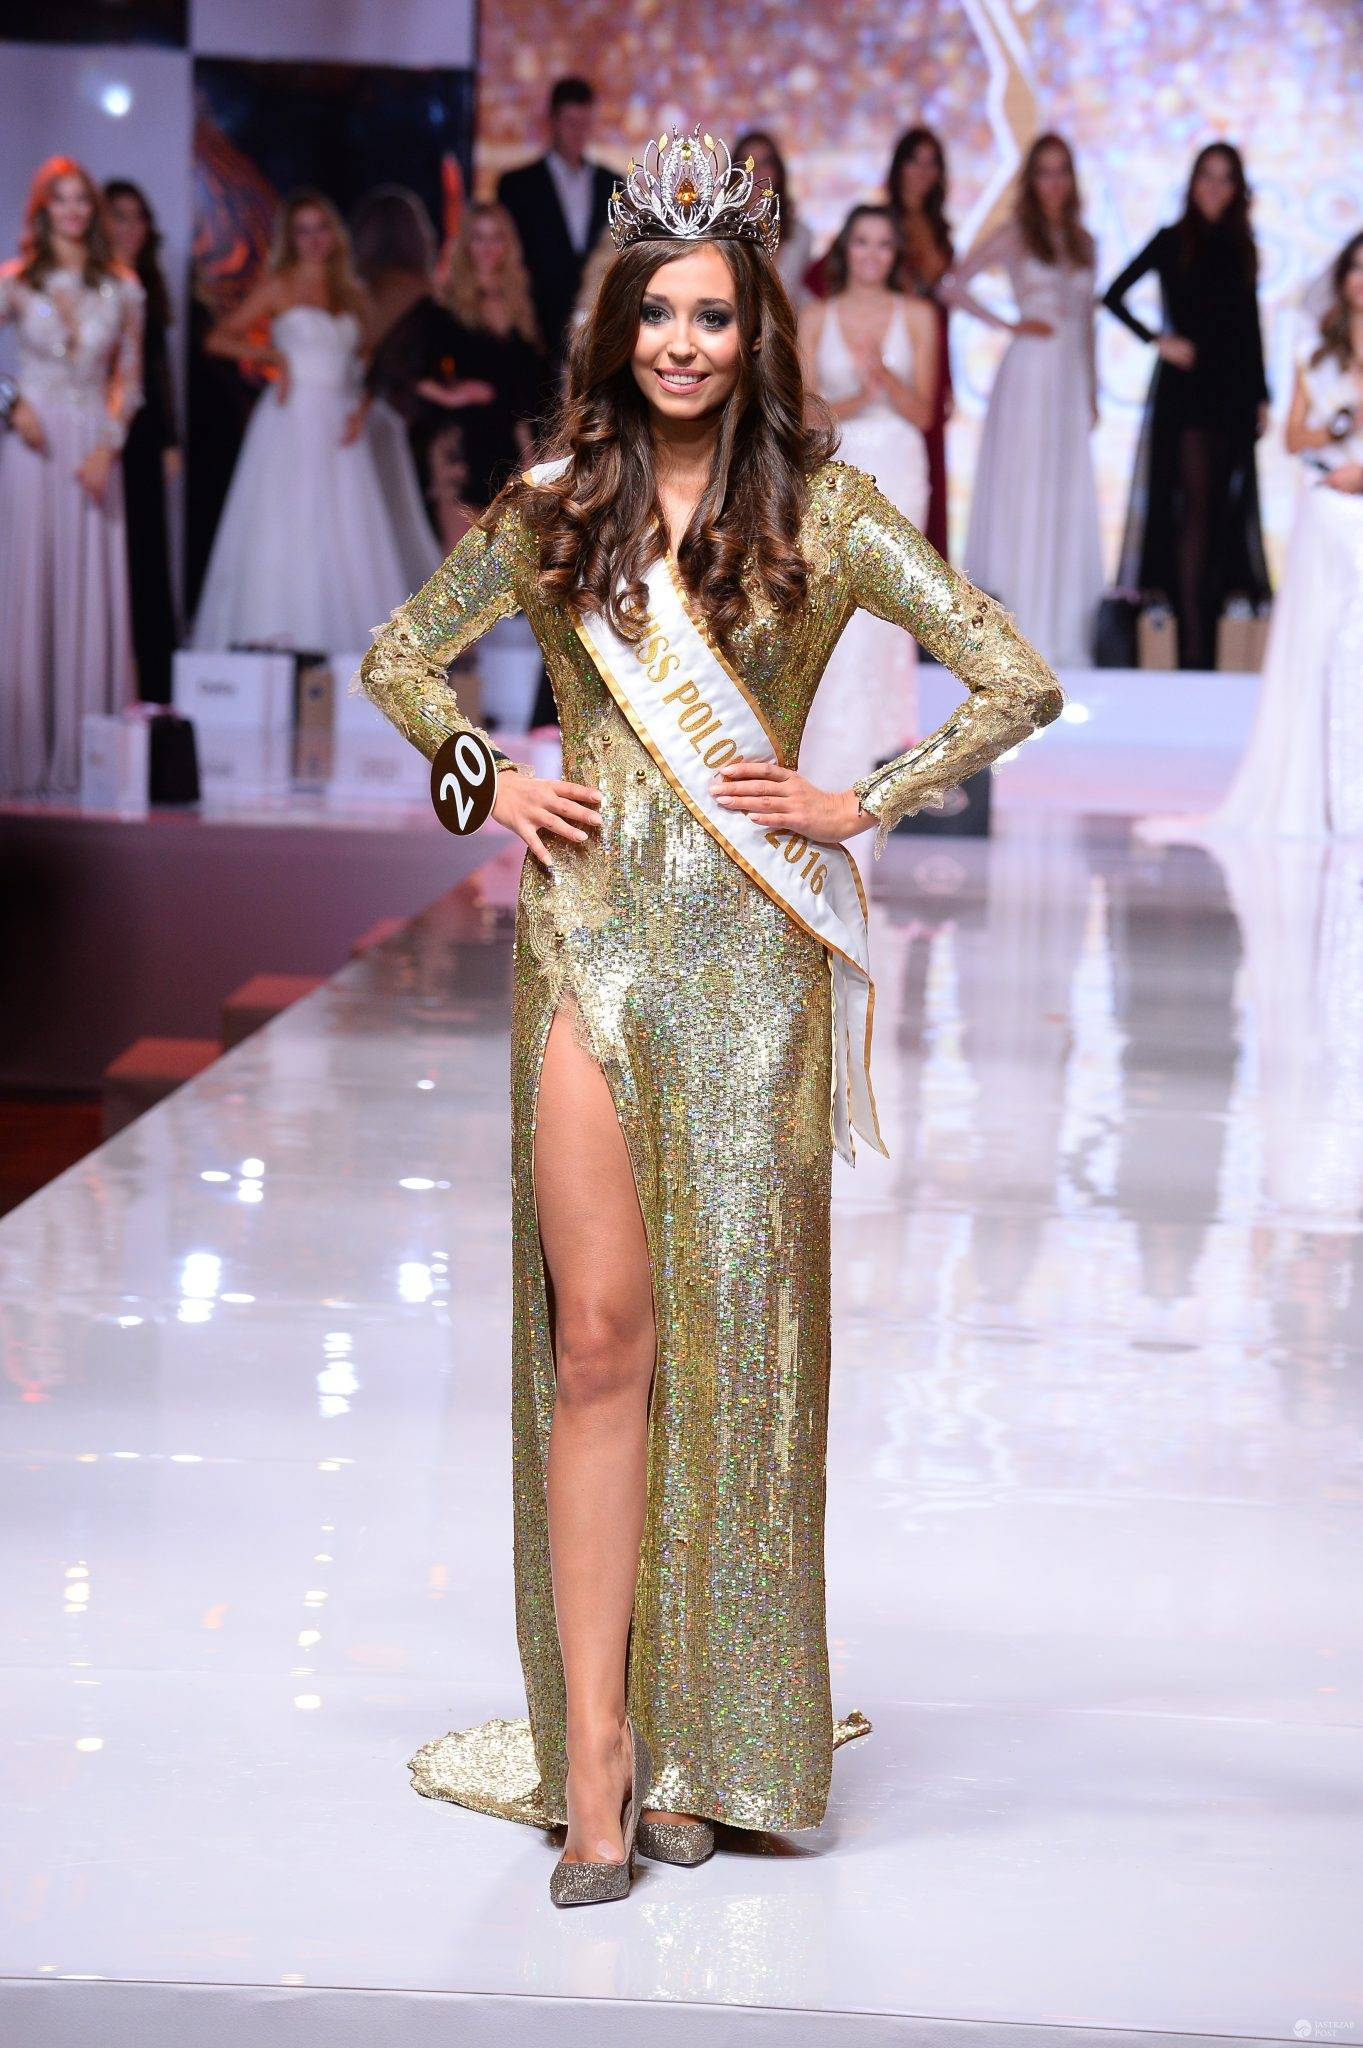 Izabella Krzan - Miss Polonia 2016